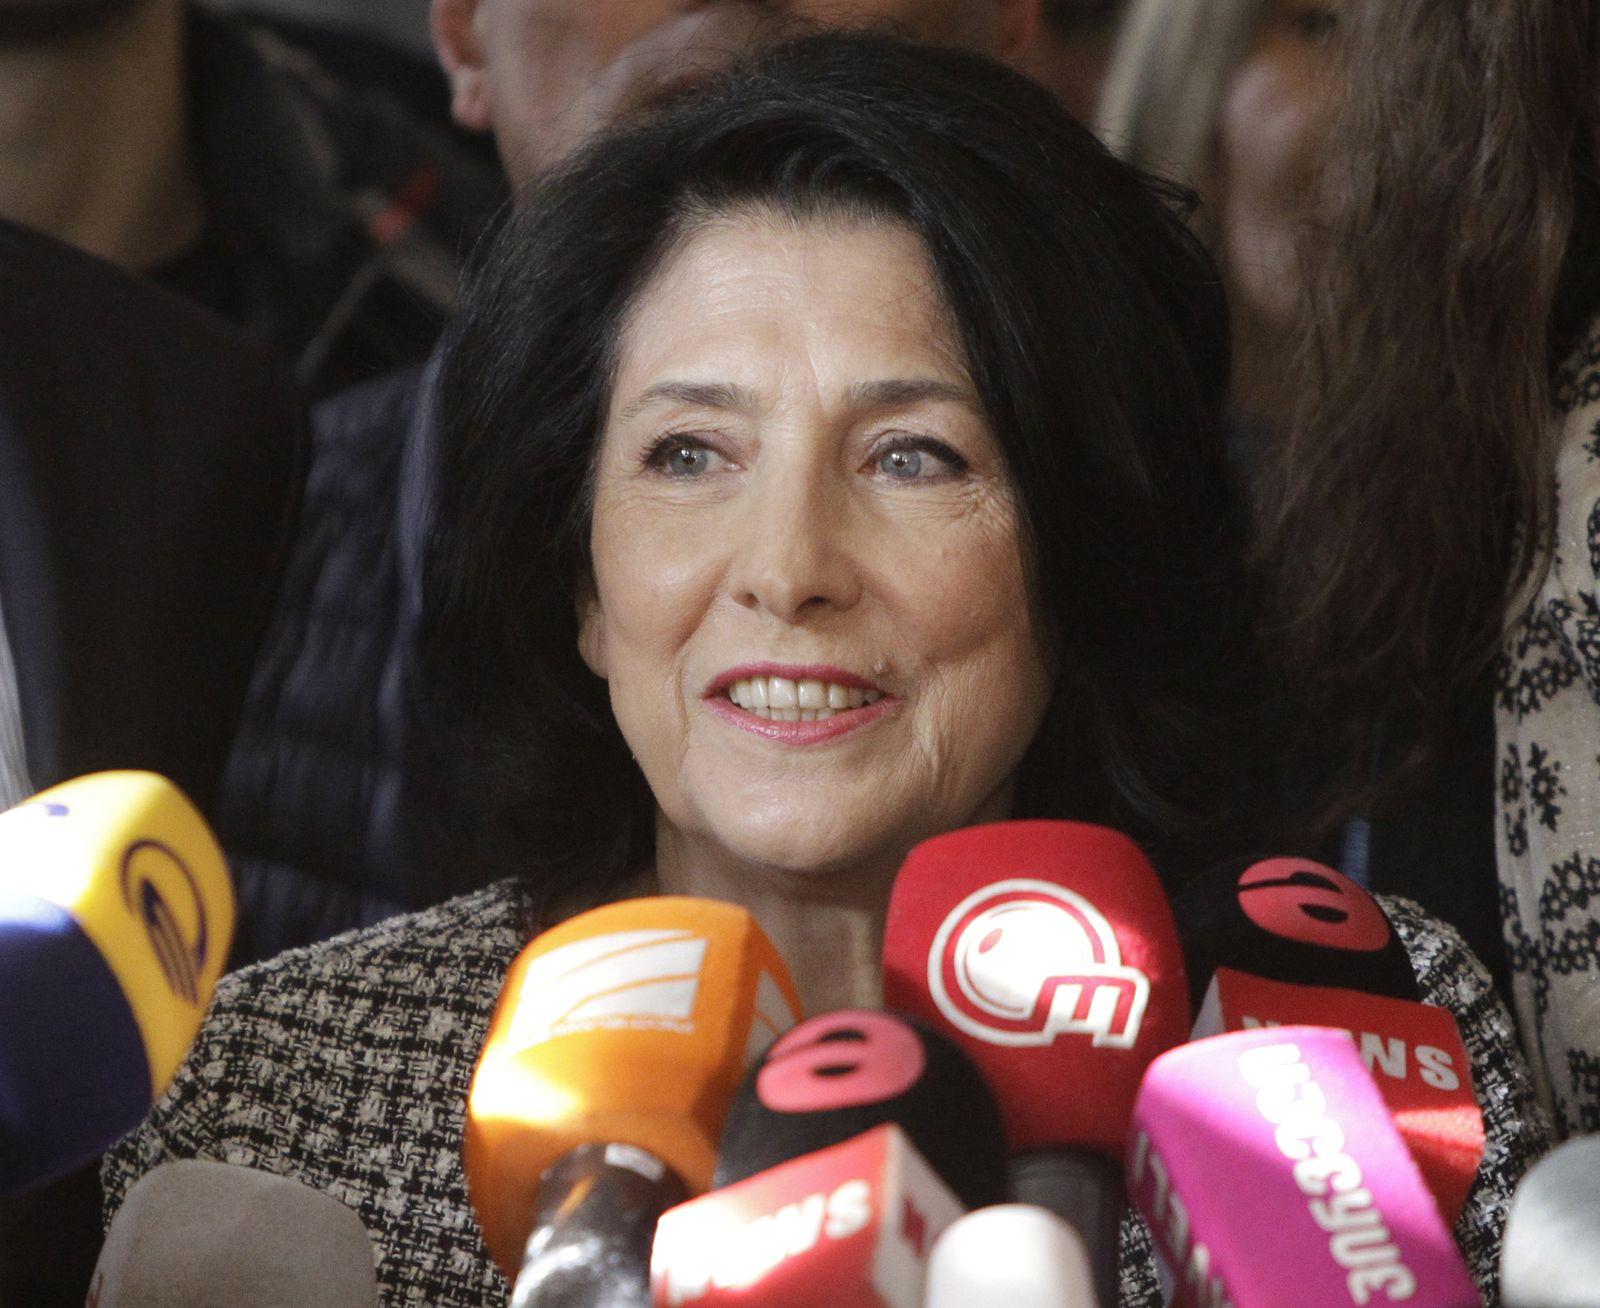 Salome Surabischwili